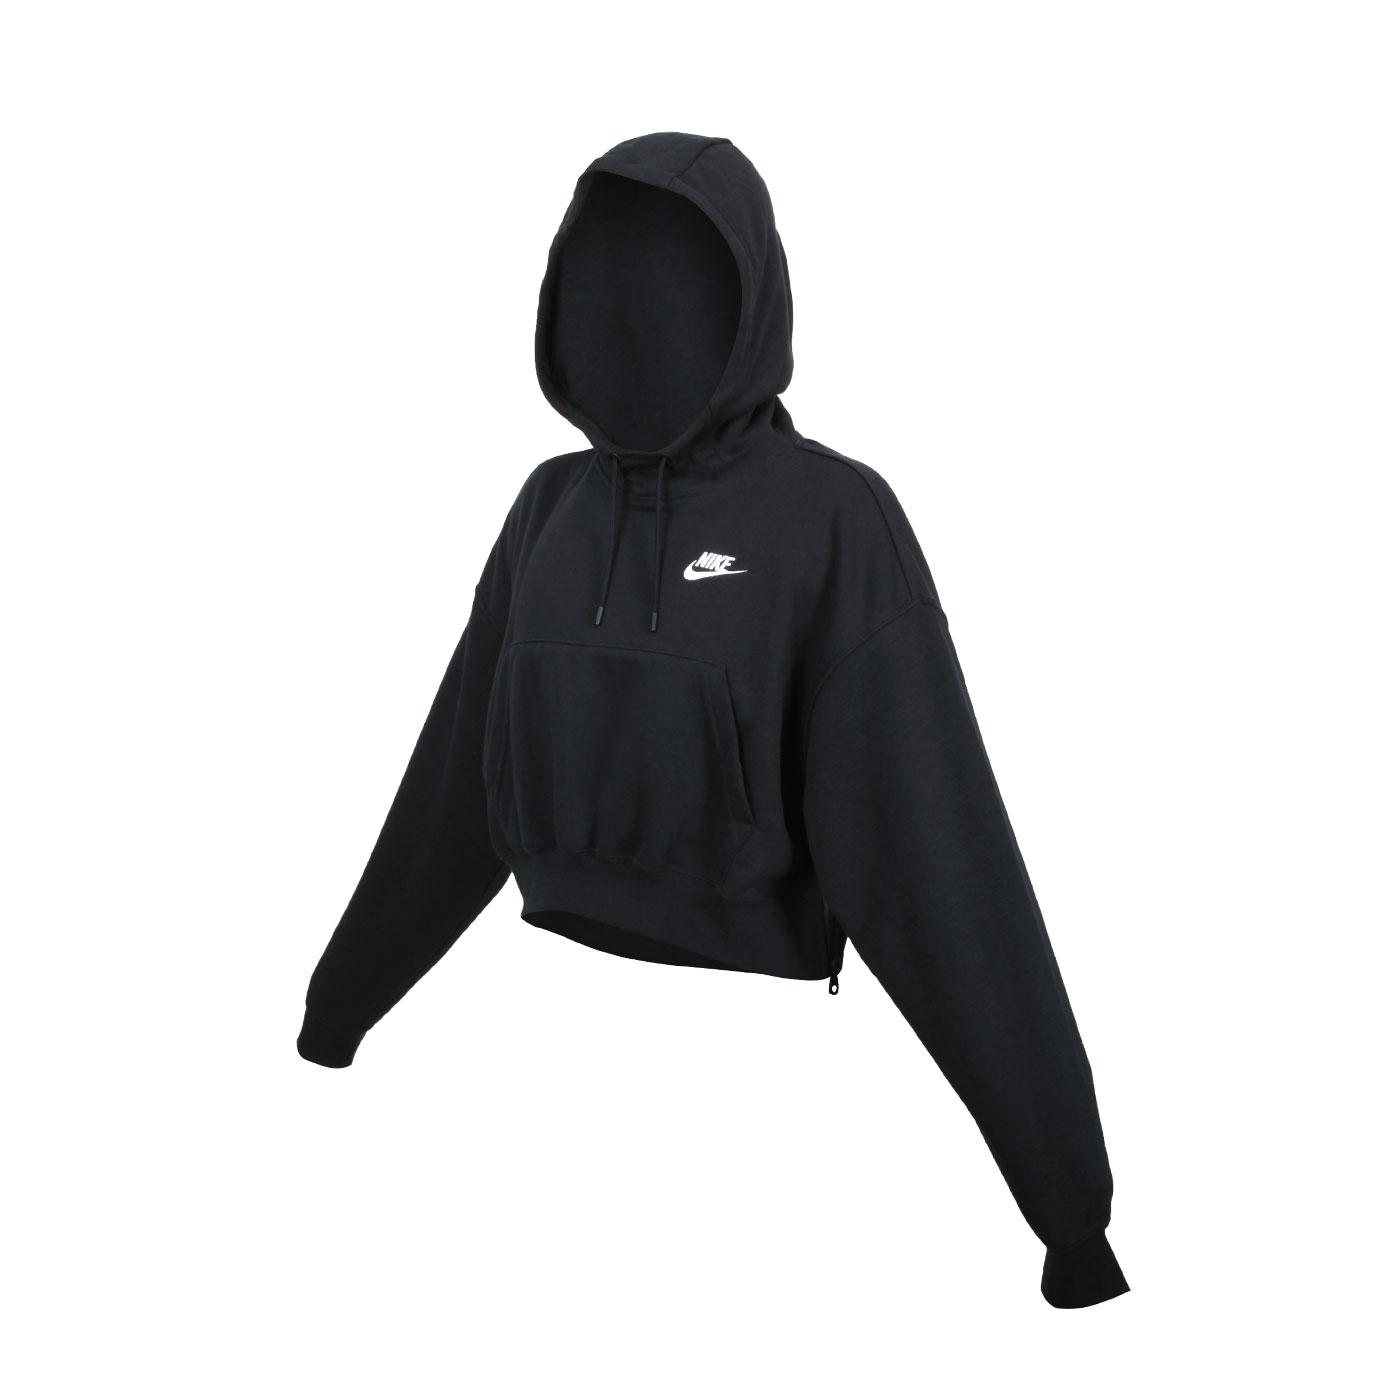 NIKE 女款連帽長袖T恤 DD5382-010 - 黑白